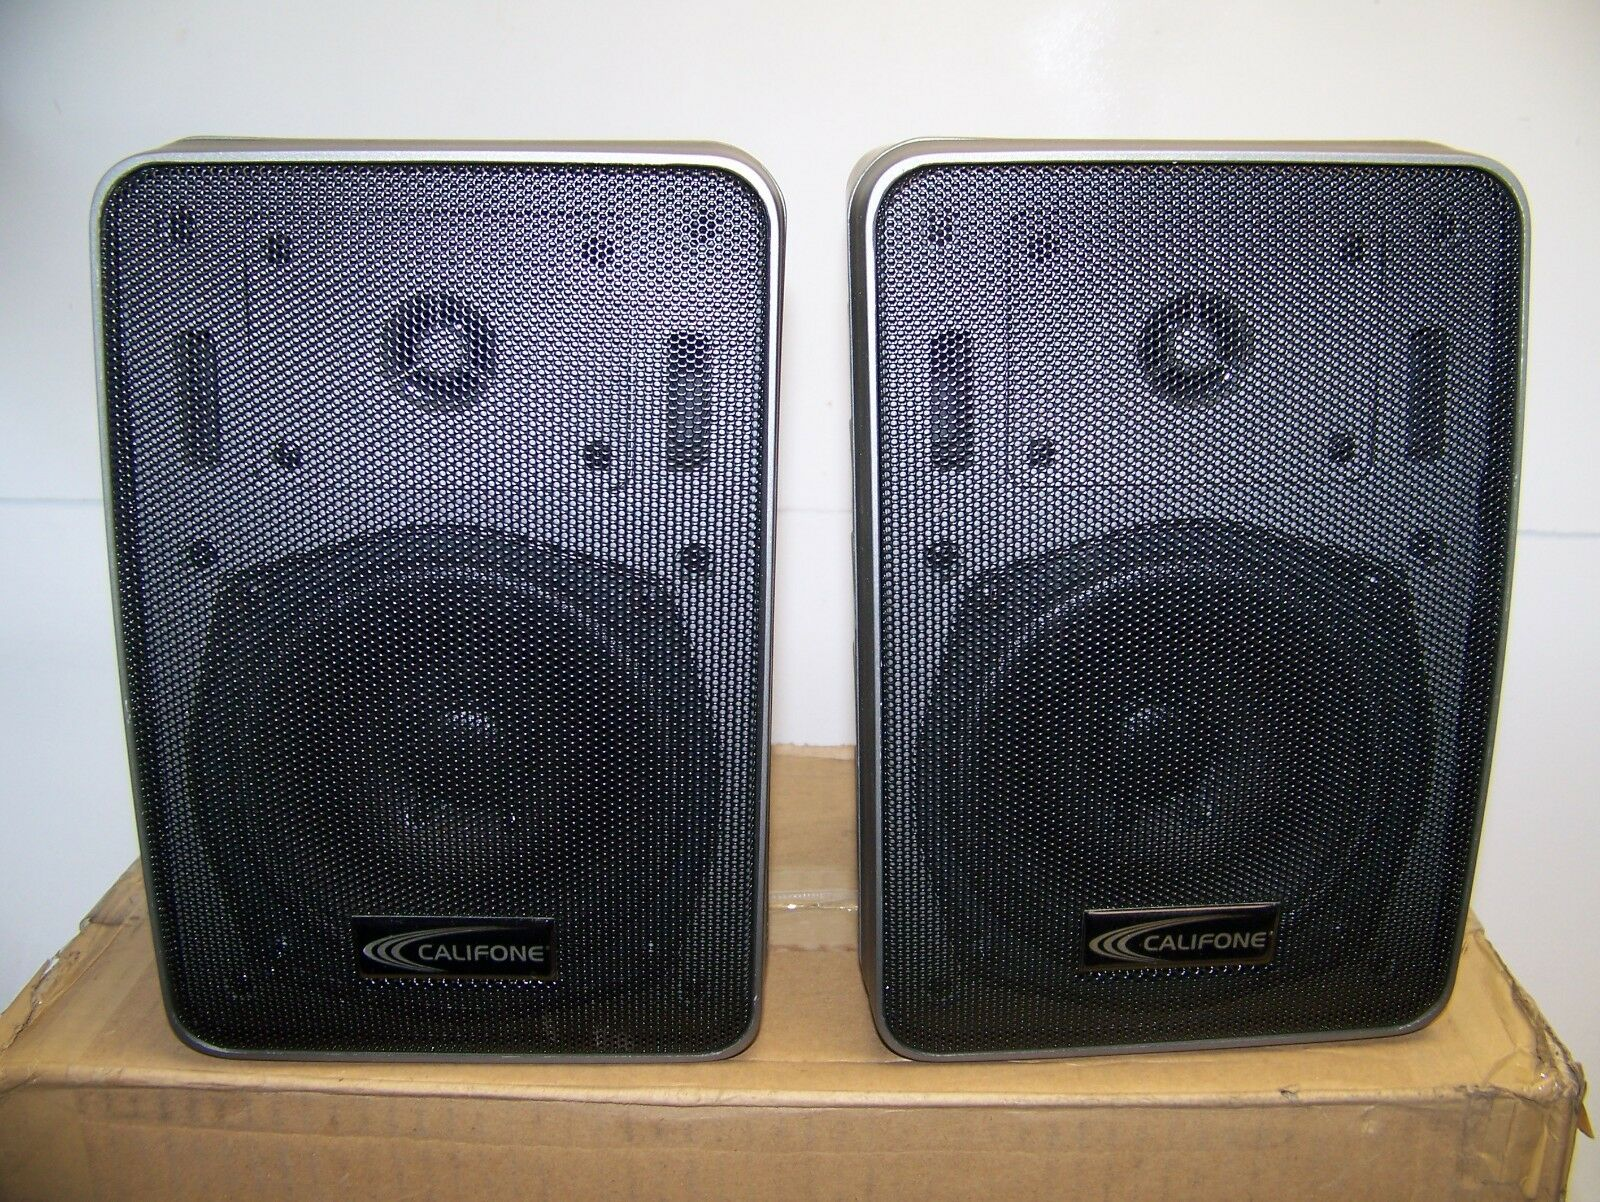 Califone SP-2500 Bookshelf Monitor Speakers Professional Companion Set Of 2